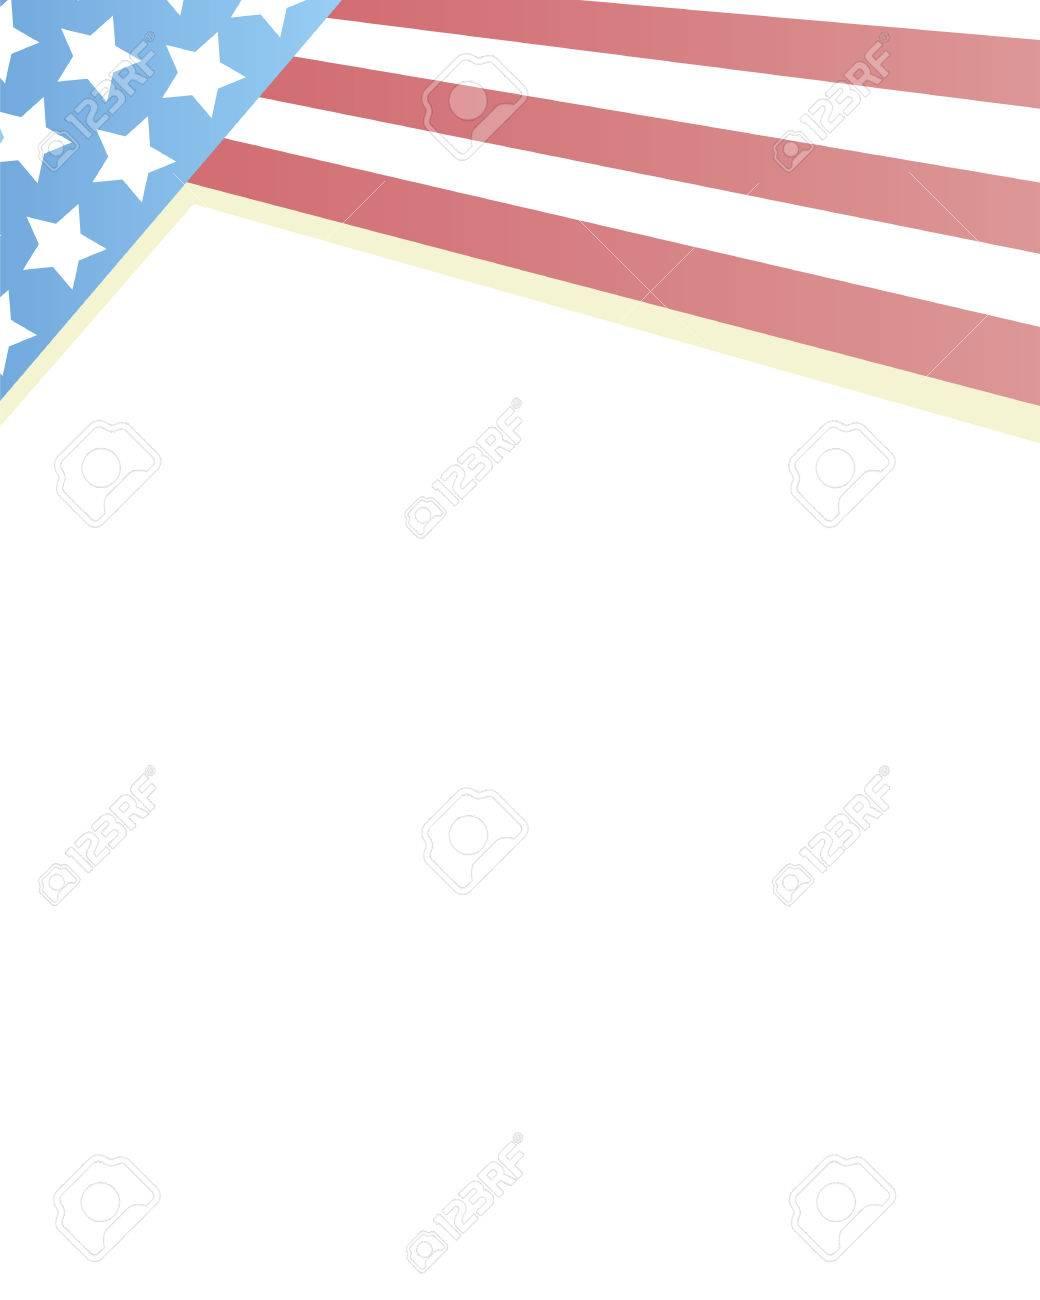 Ziemlich Amerikanisch Framing Fotos - Bilderrahmen Ideen - szurop.info